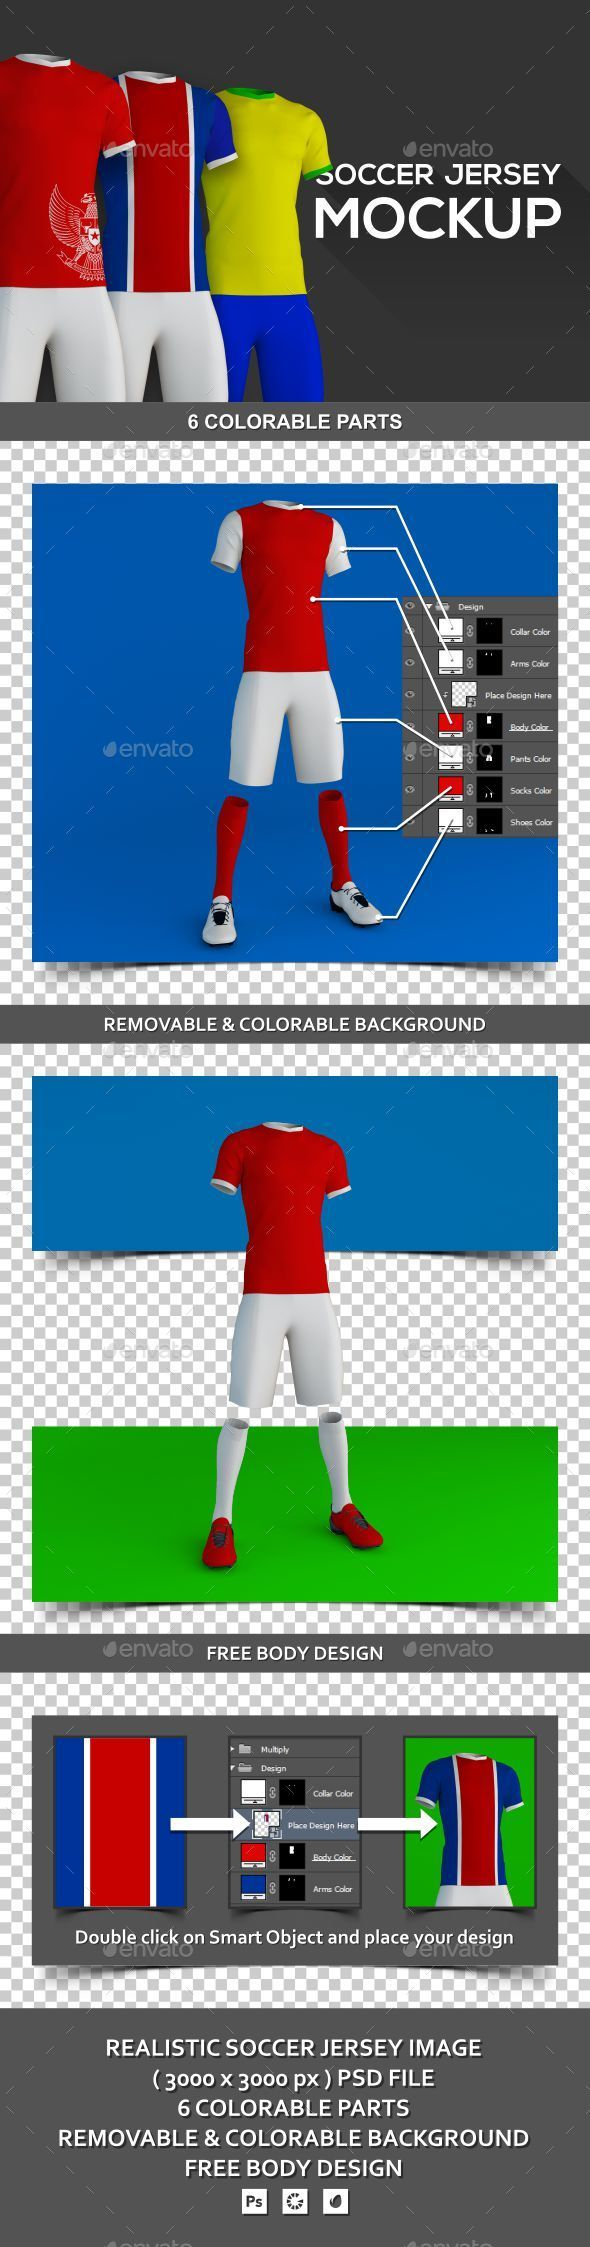 Download Soccer Jersey Mockup Mockup Soccer Jersey Clothing Mockup